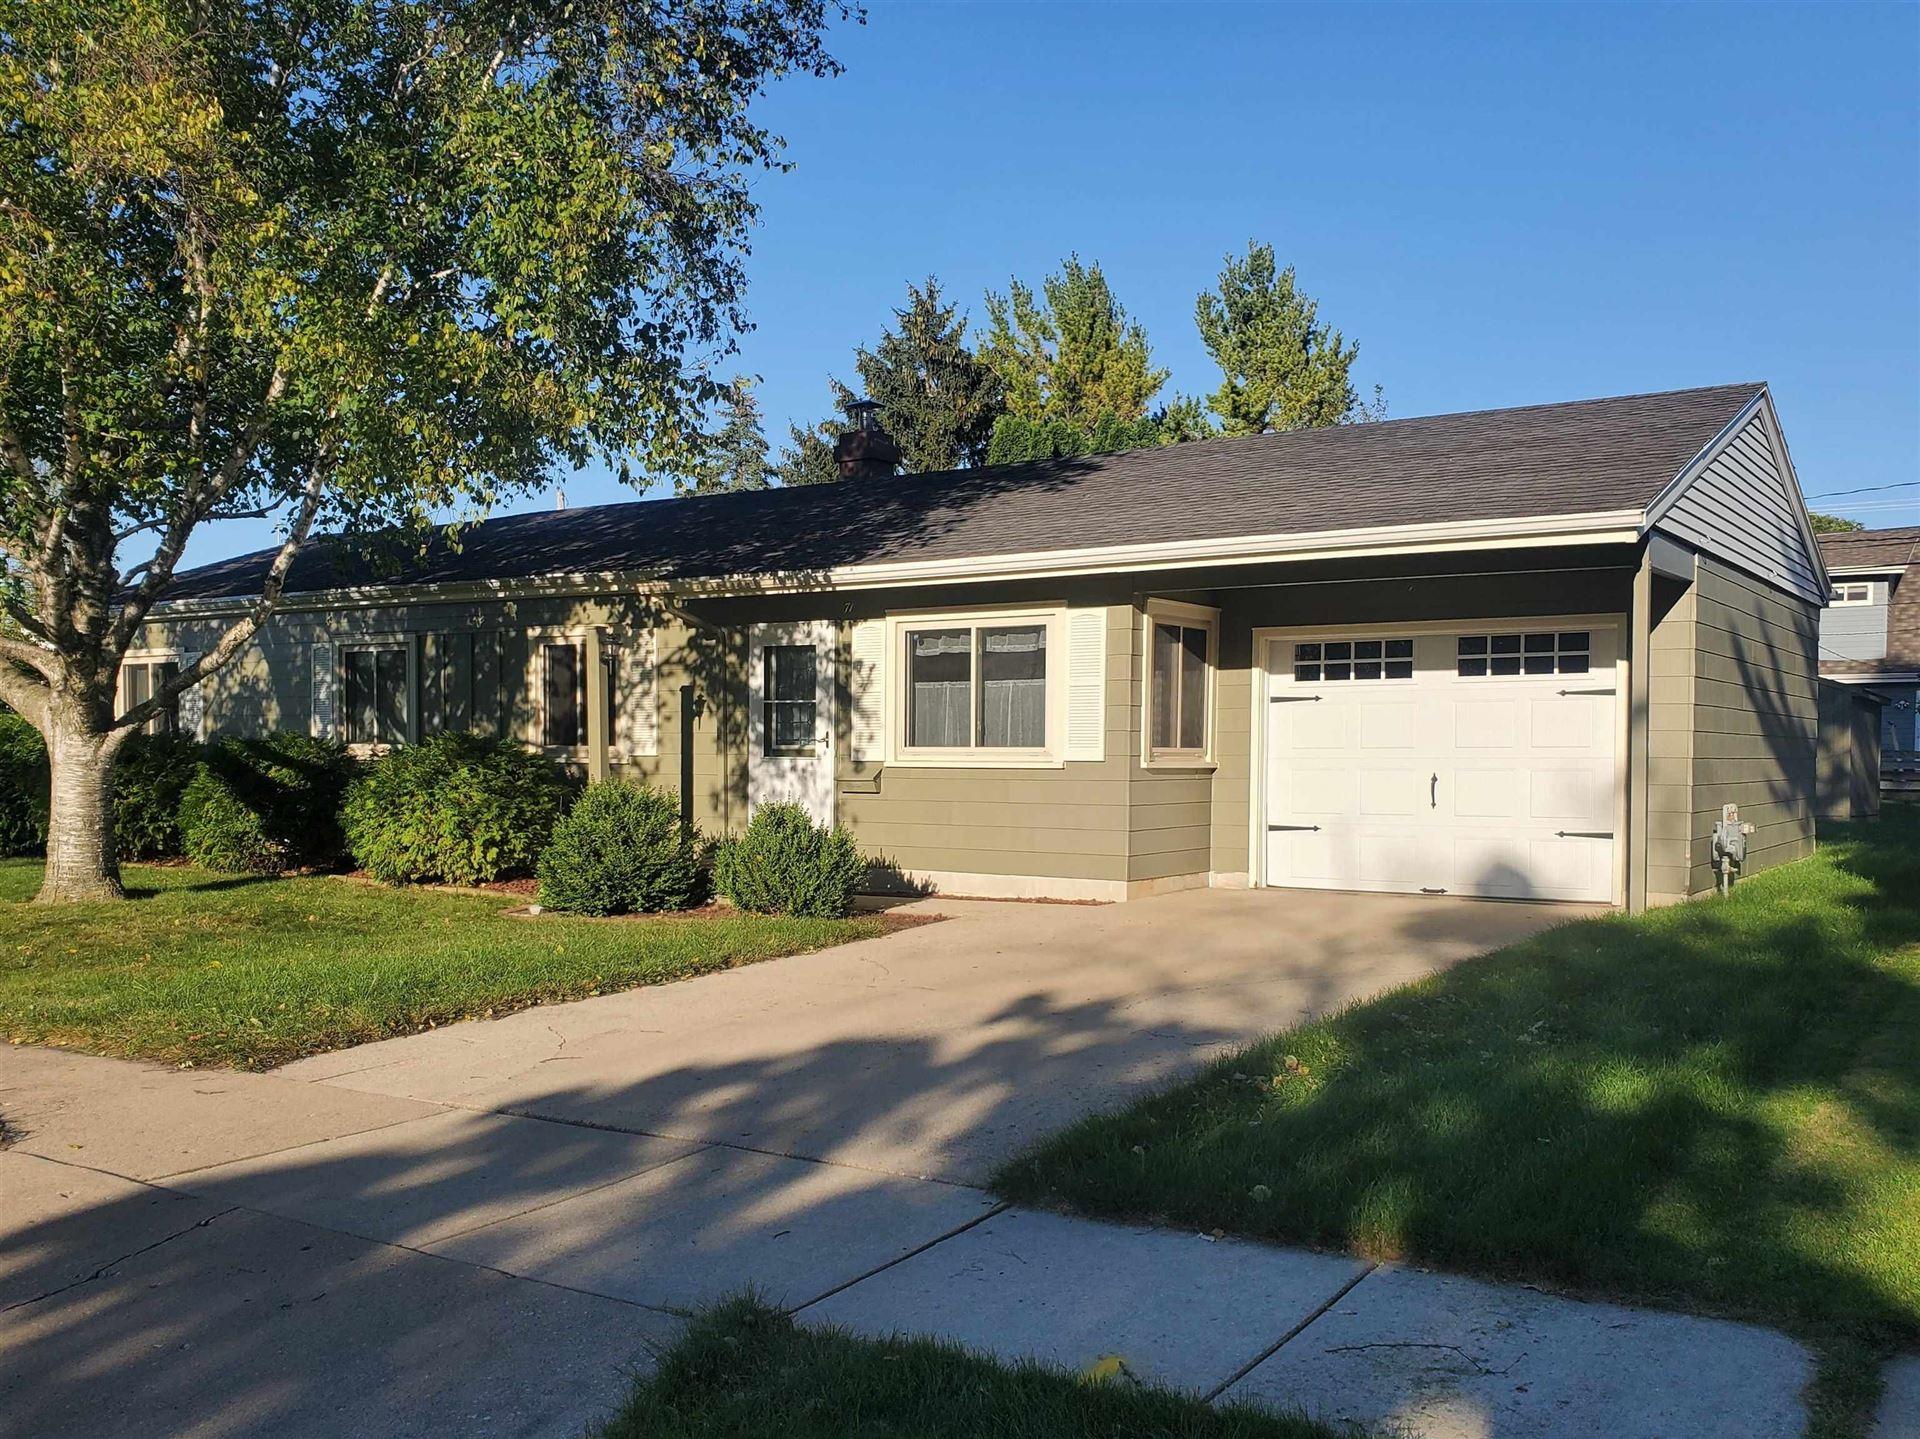 71 S ROYAL Avenue, Fond du Lac, WI 54935 - MLS#: 50248356